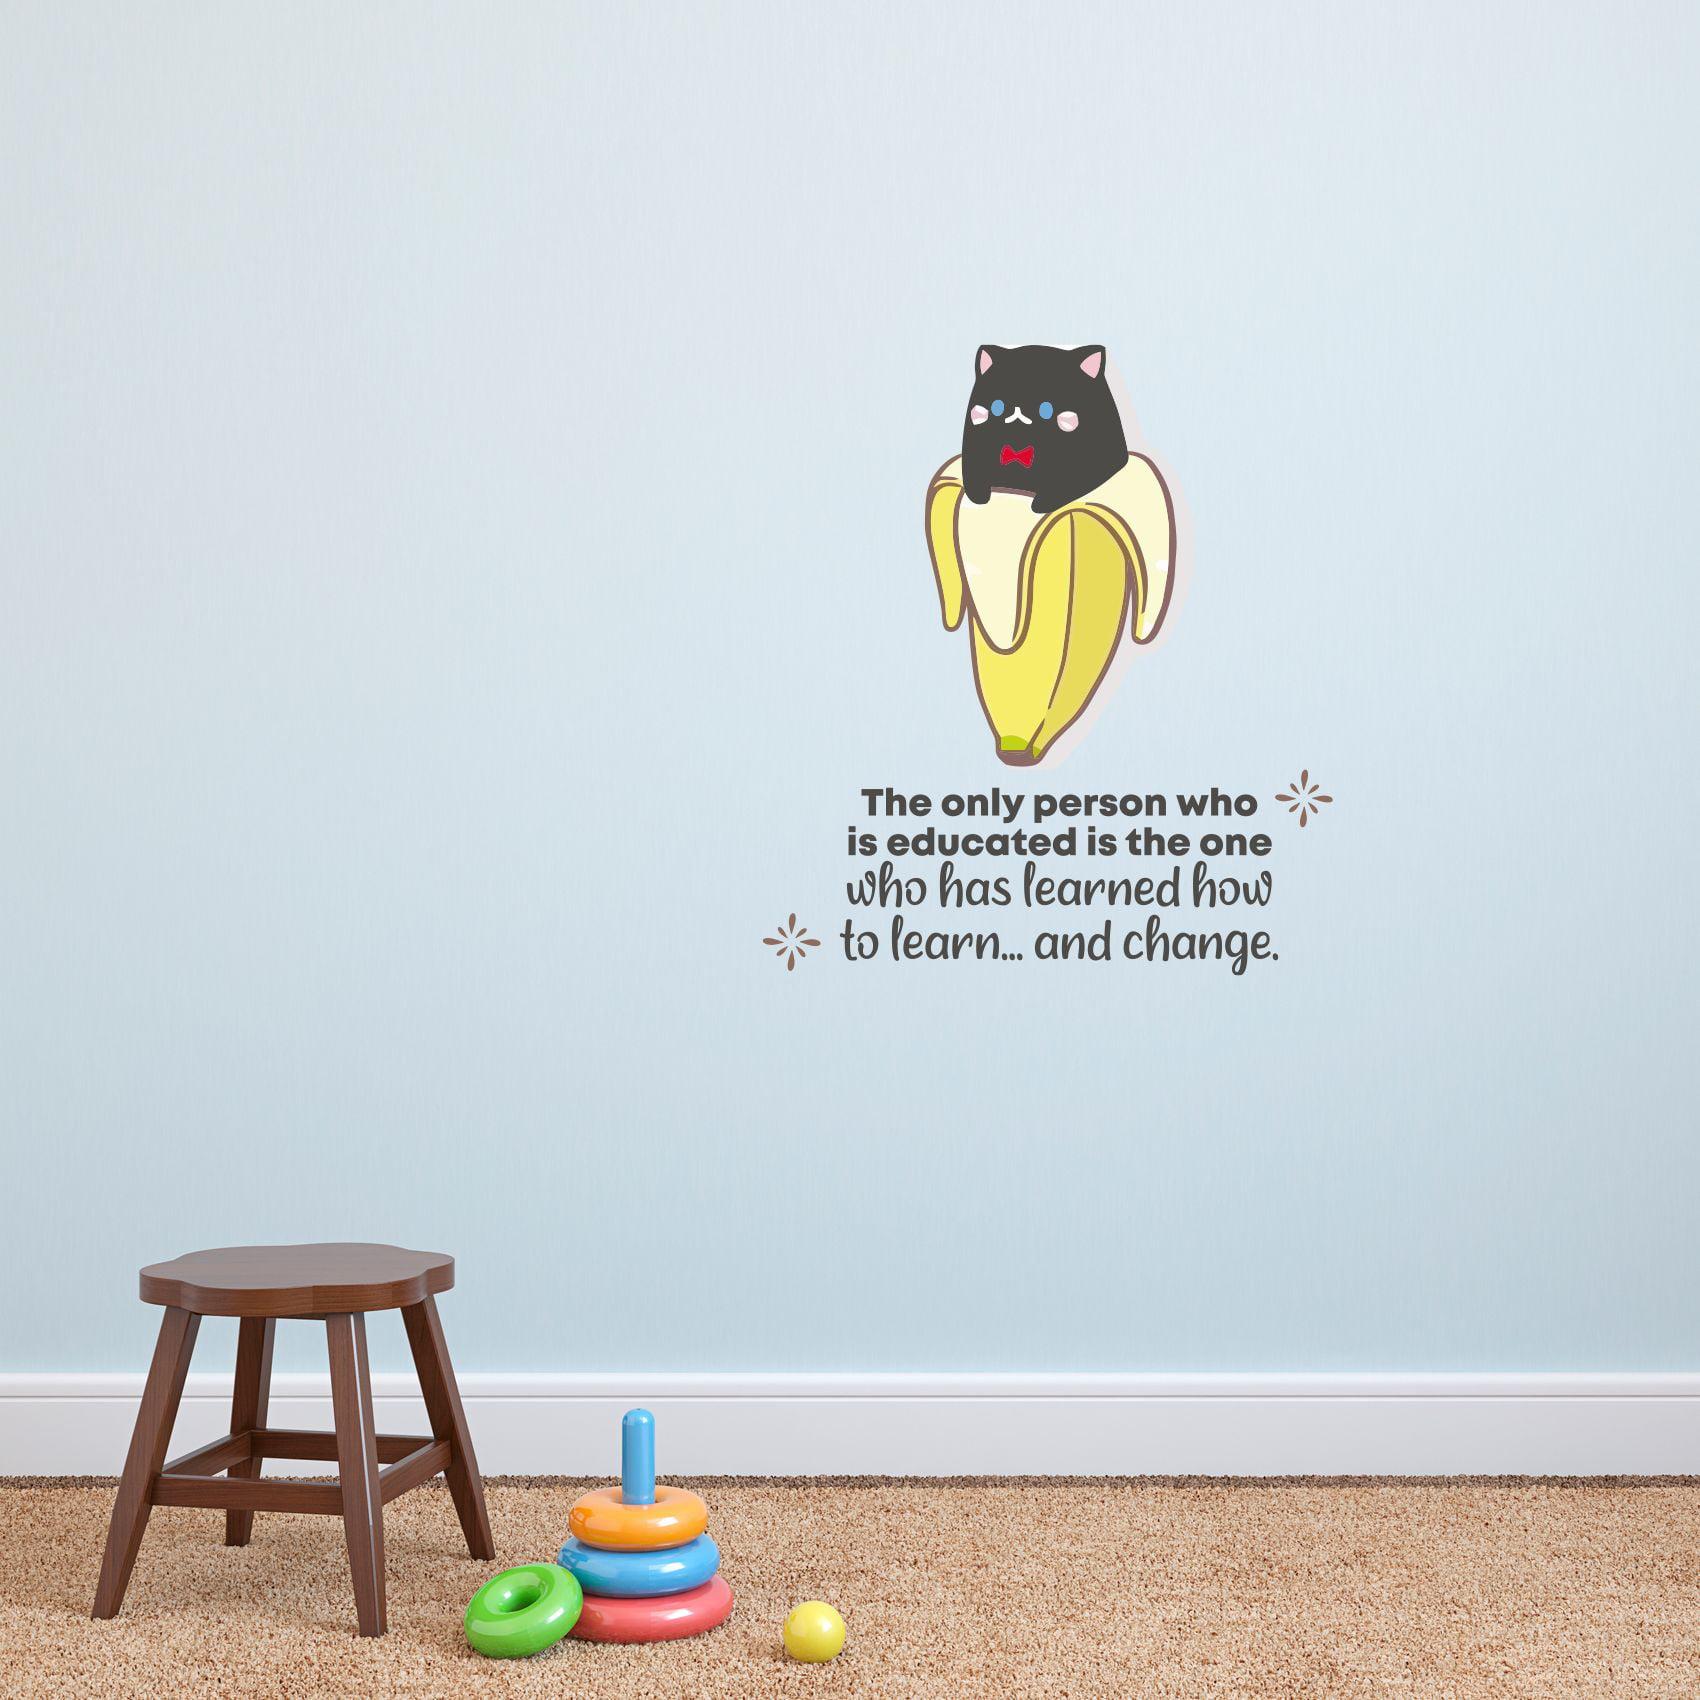 Educated Banana Cat Cute Quote Cartoon Quotes Decors Wall Sticker Art Design Decal For Girls Boys Kids Room Bedroom Nursery Kindergarten Home Decor Stickers Wall Art Vinyl Decoration 10x8 Inch Walmart Com